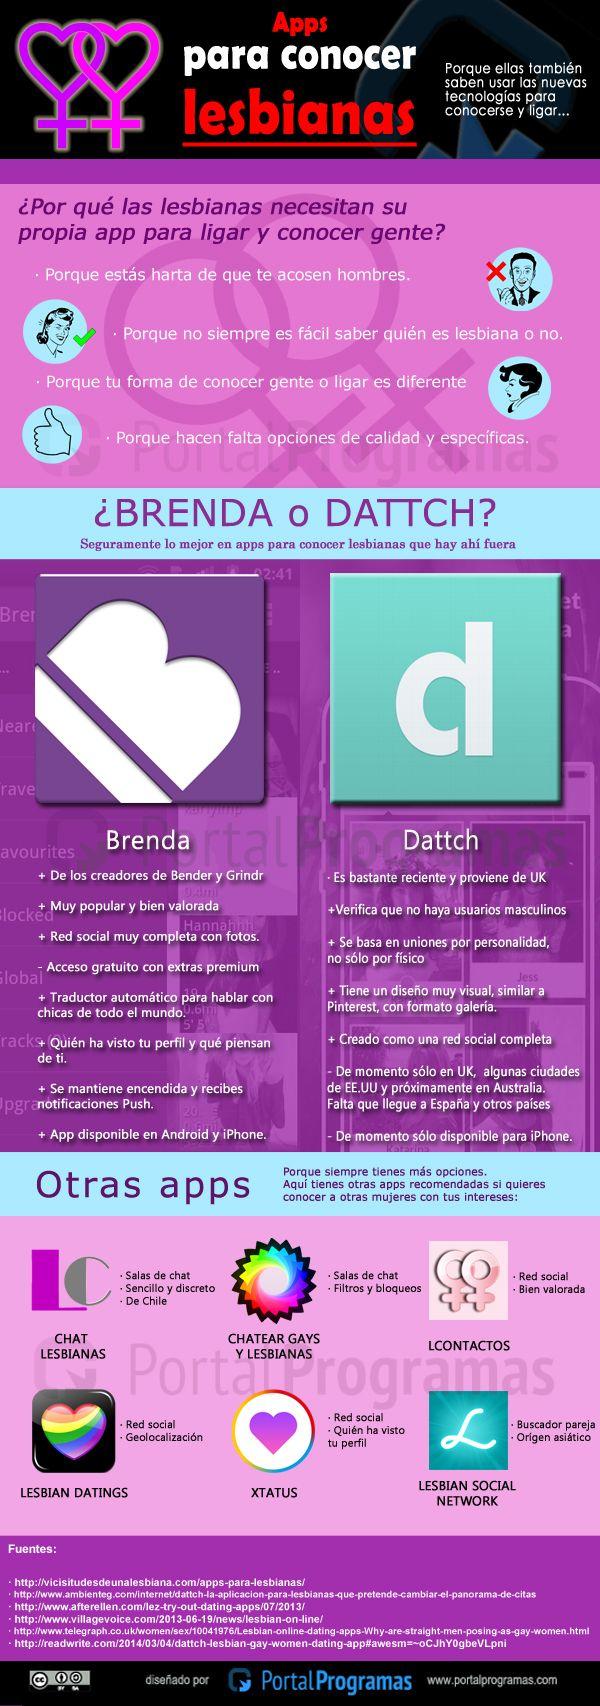 Las mejores apps para conocer #lesbianas. #Infografía  http://www.portalprogramas.com/milbits/informatica/apps-conocer-lesbianas.html